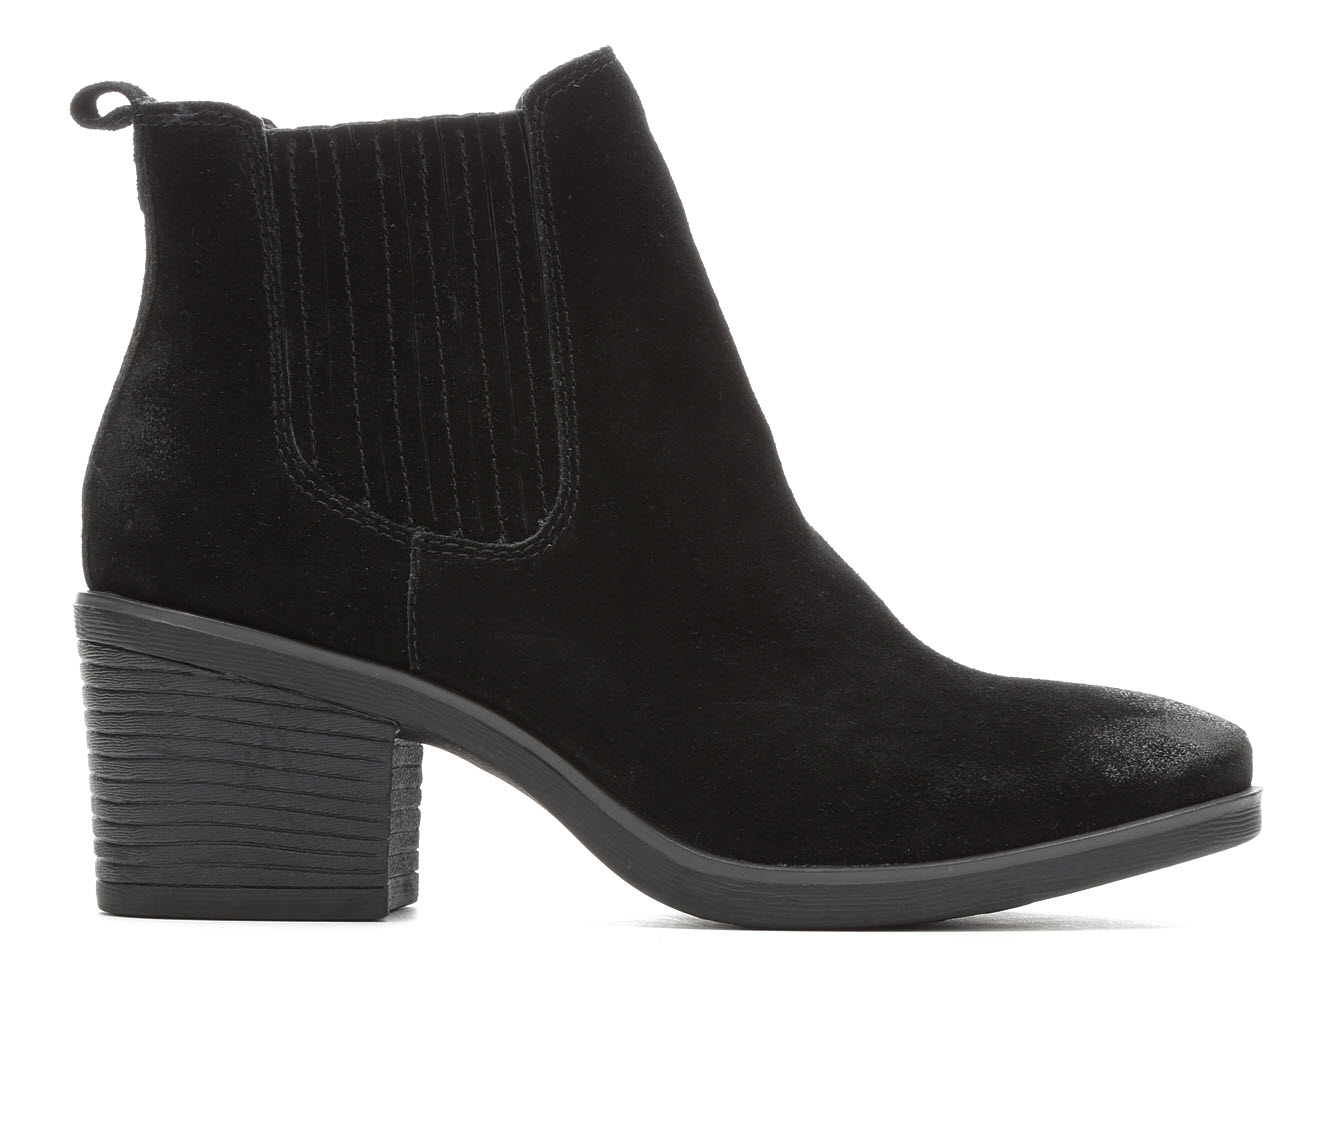 EuroSoft Jennica Women's Boots (Black - Suede)